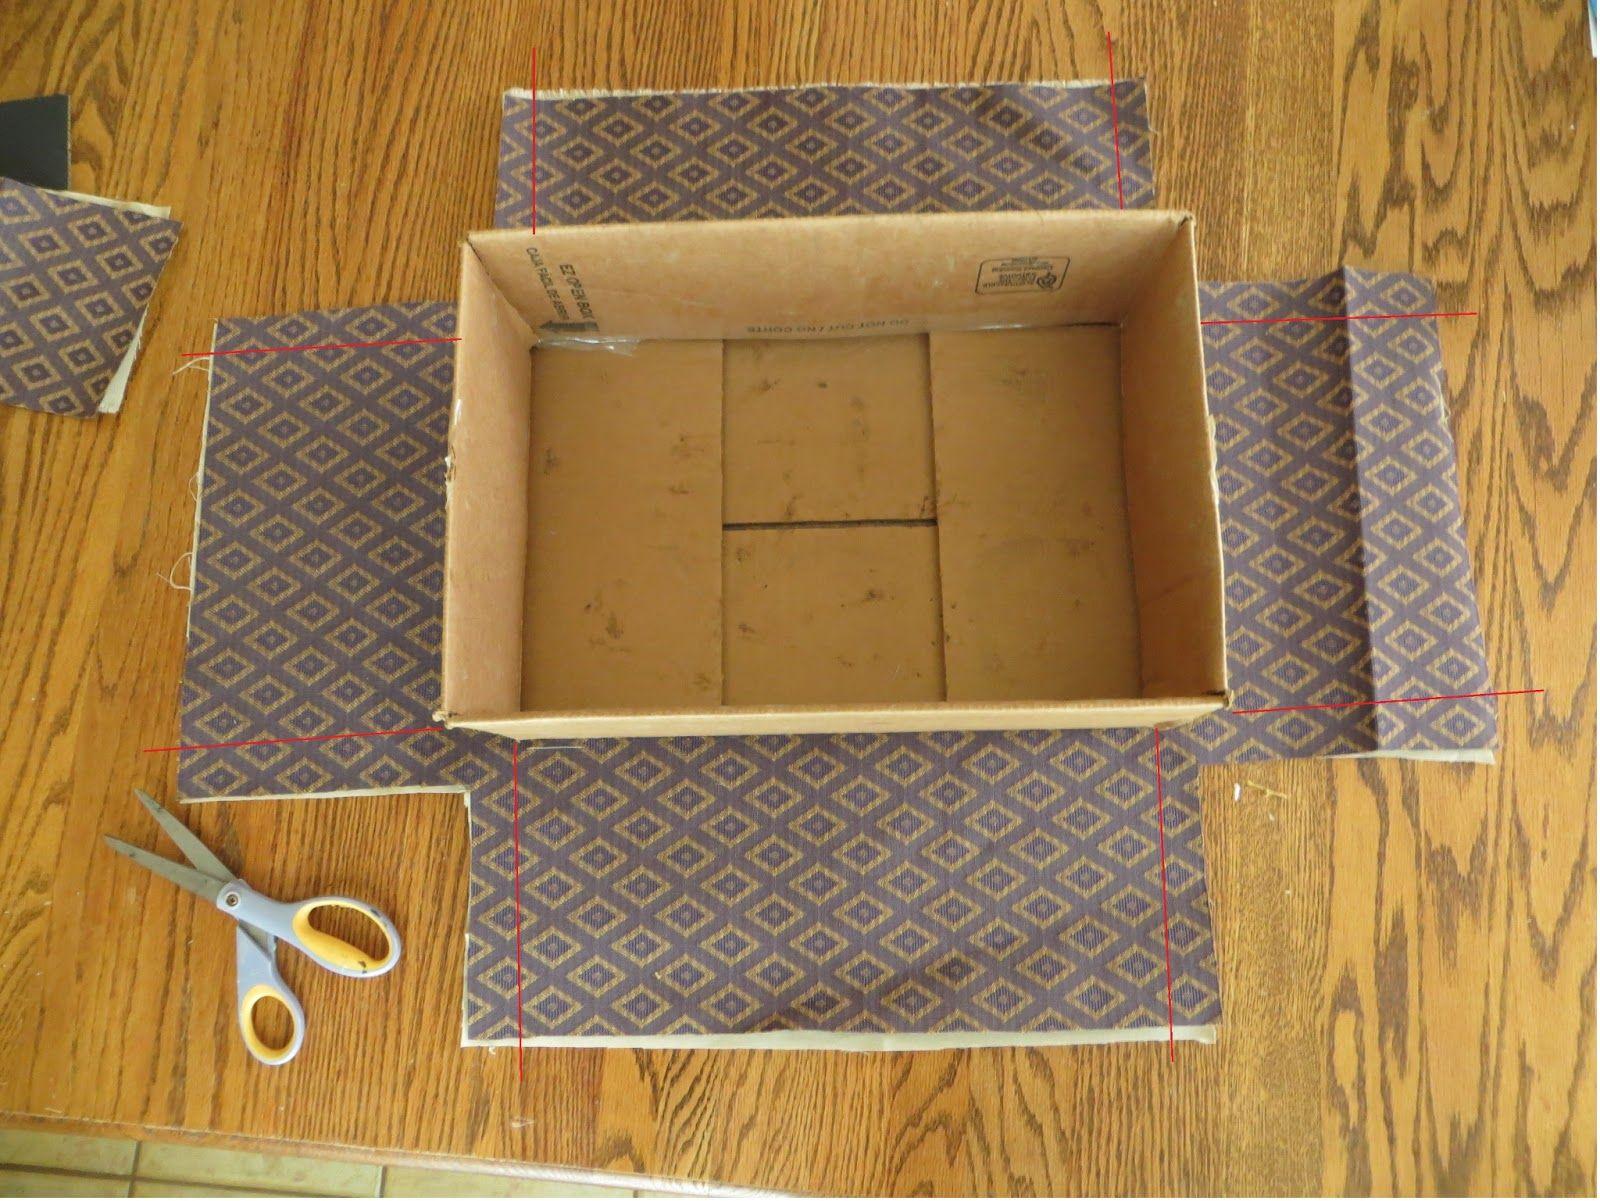 C mo forrar cajas almacenaje - Cajas almacenaje decorativas ...